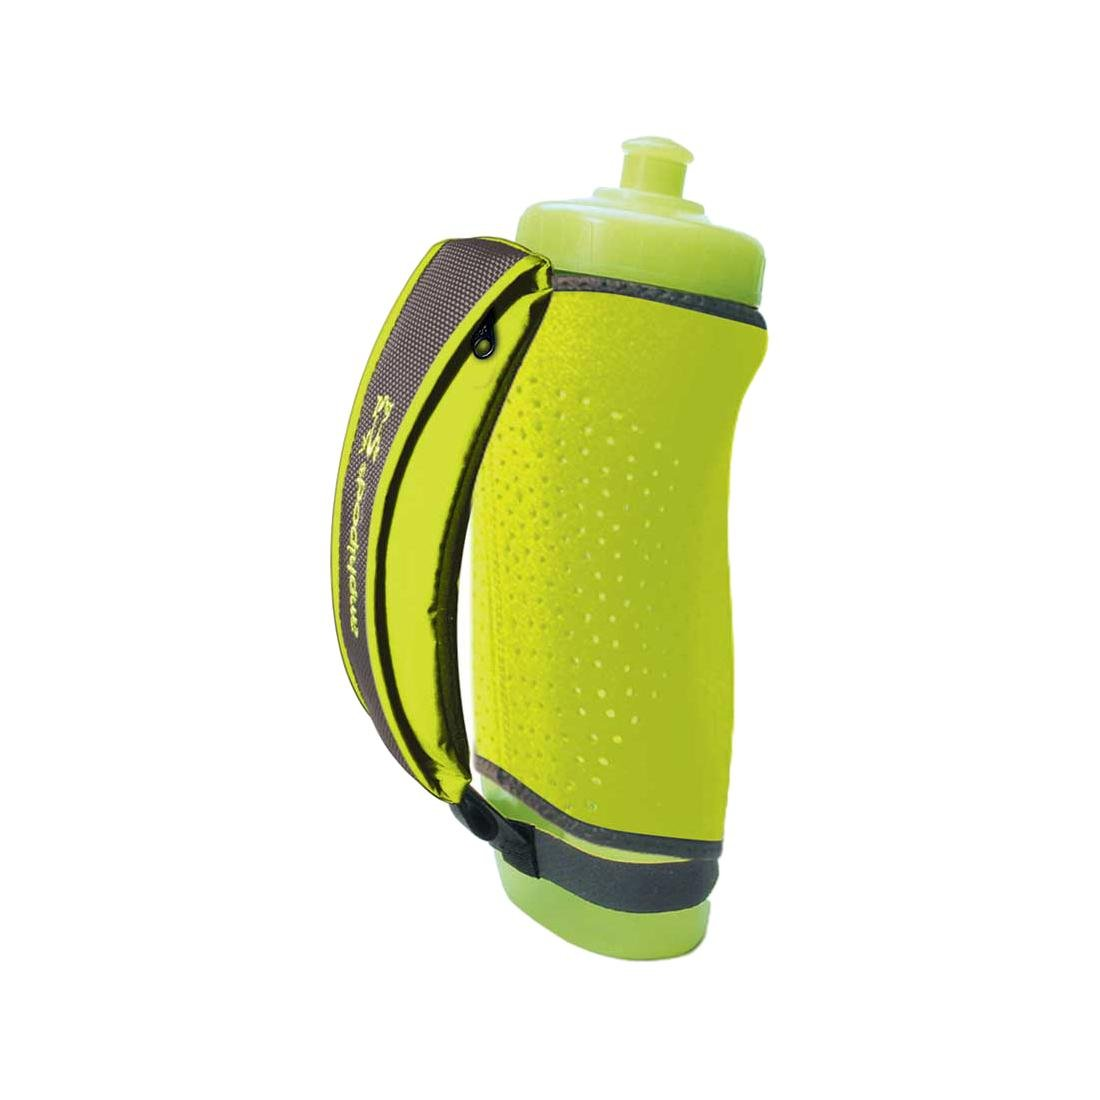 Amphipod Hydraform Thermal-Lite Handheld BPA-Free Water Bottle 20oz Amphipod Inc